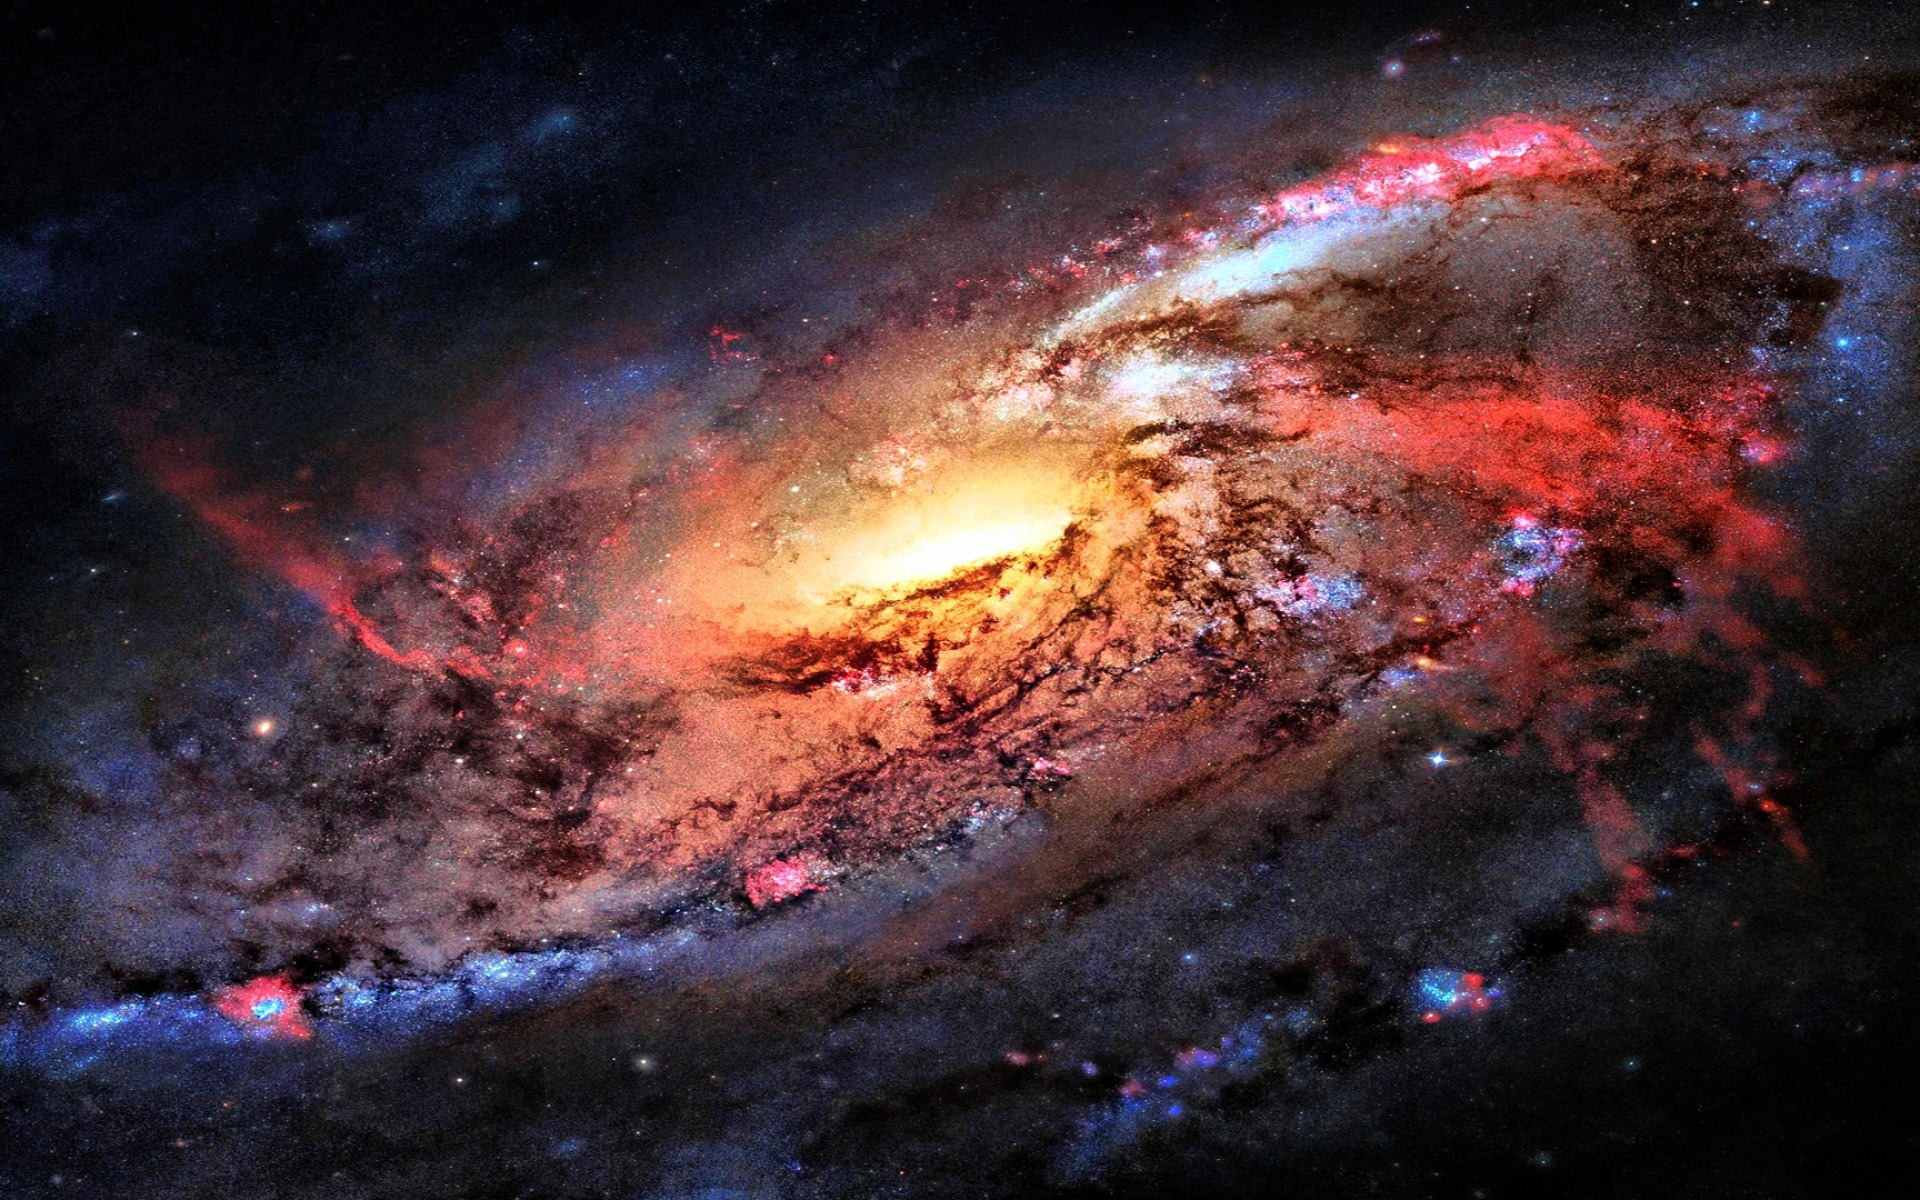 space flight sky stars Space HD Wallpaper 1920x1200